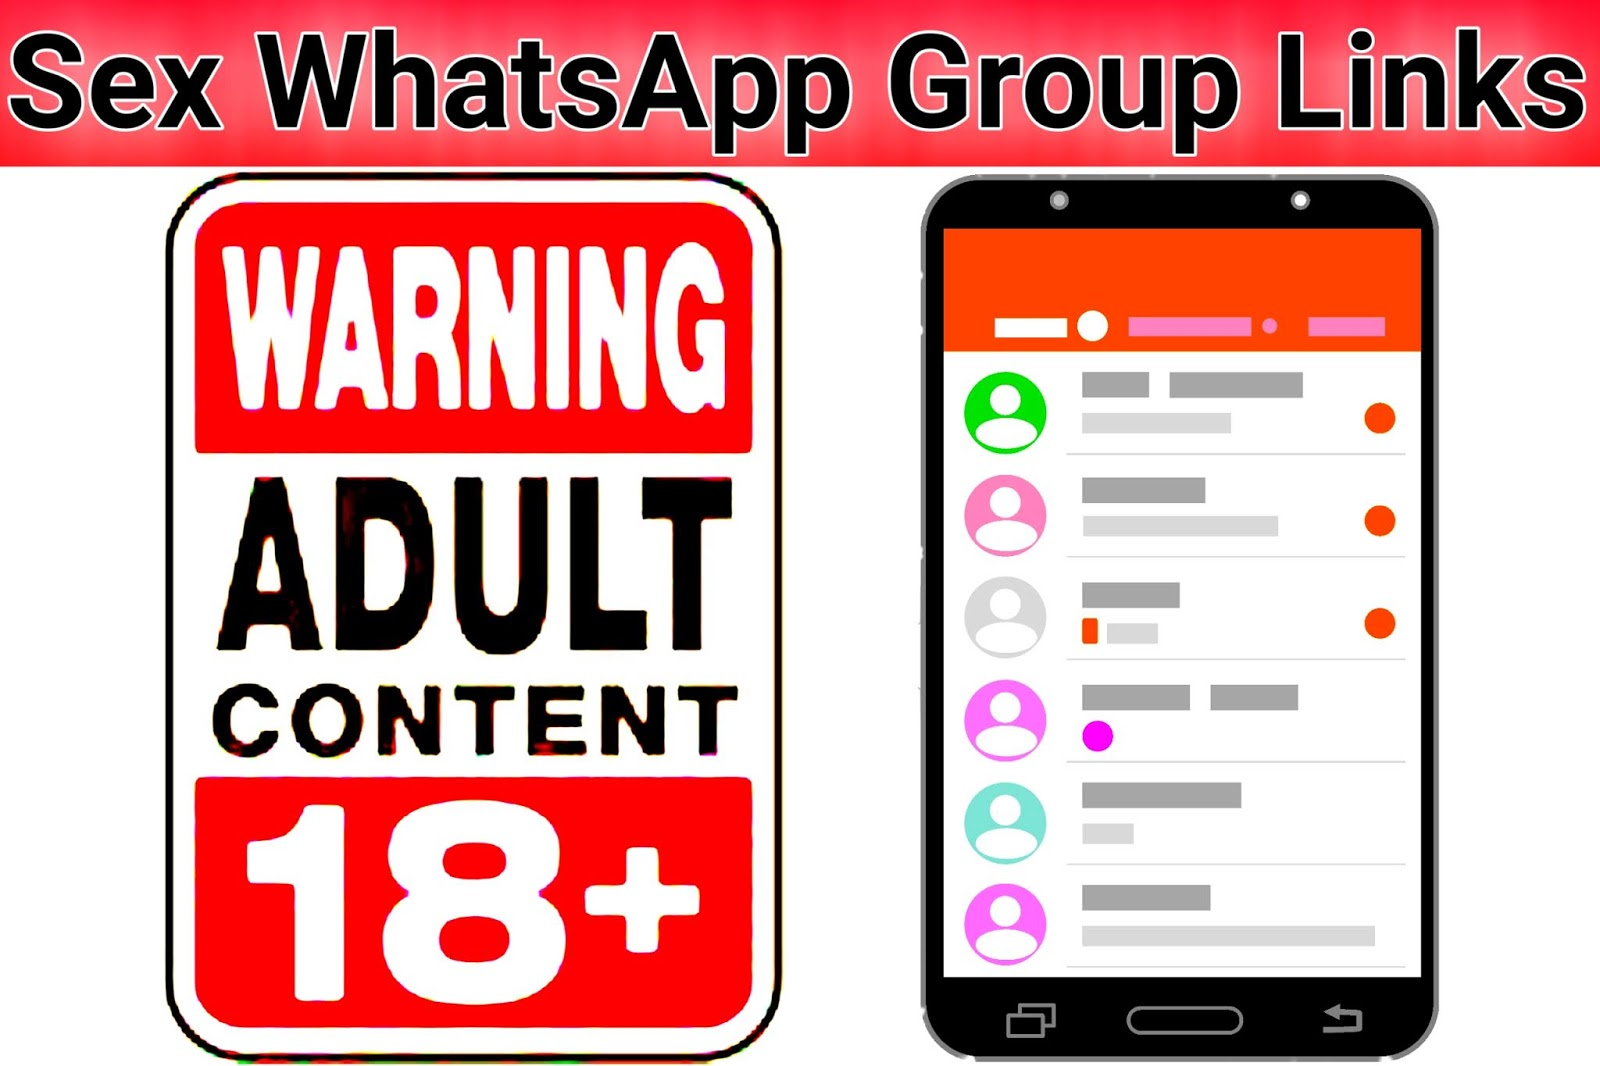 Sex WhatsApp Group Link - Sex WhatsApp Group Join Links